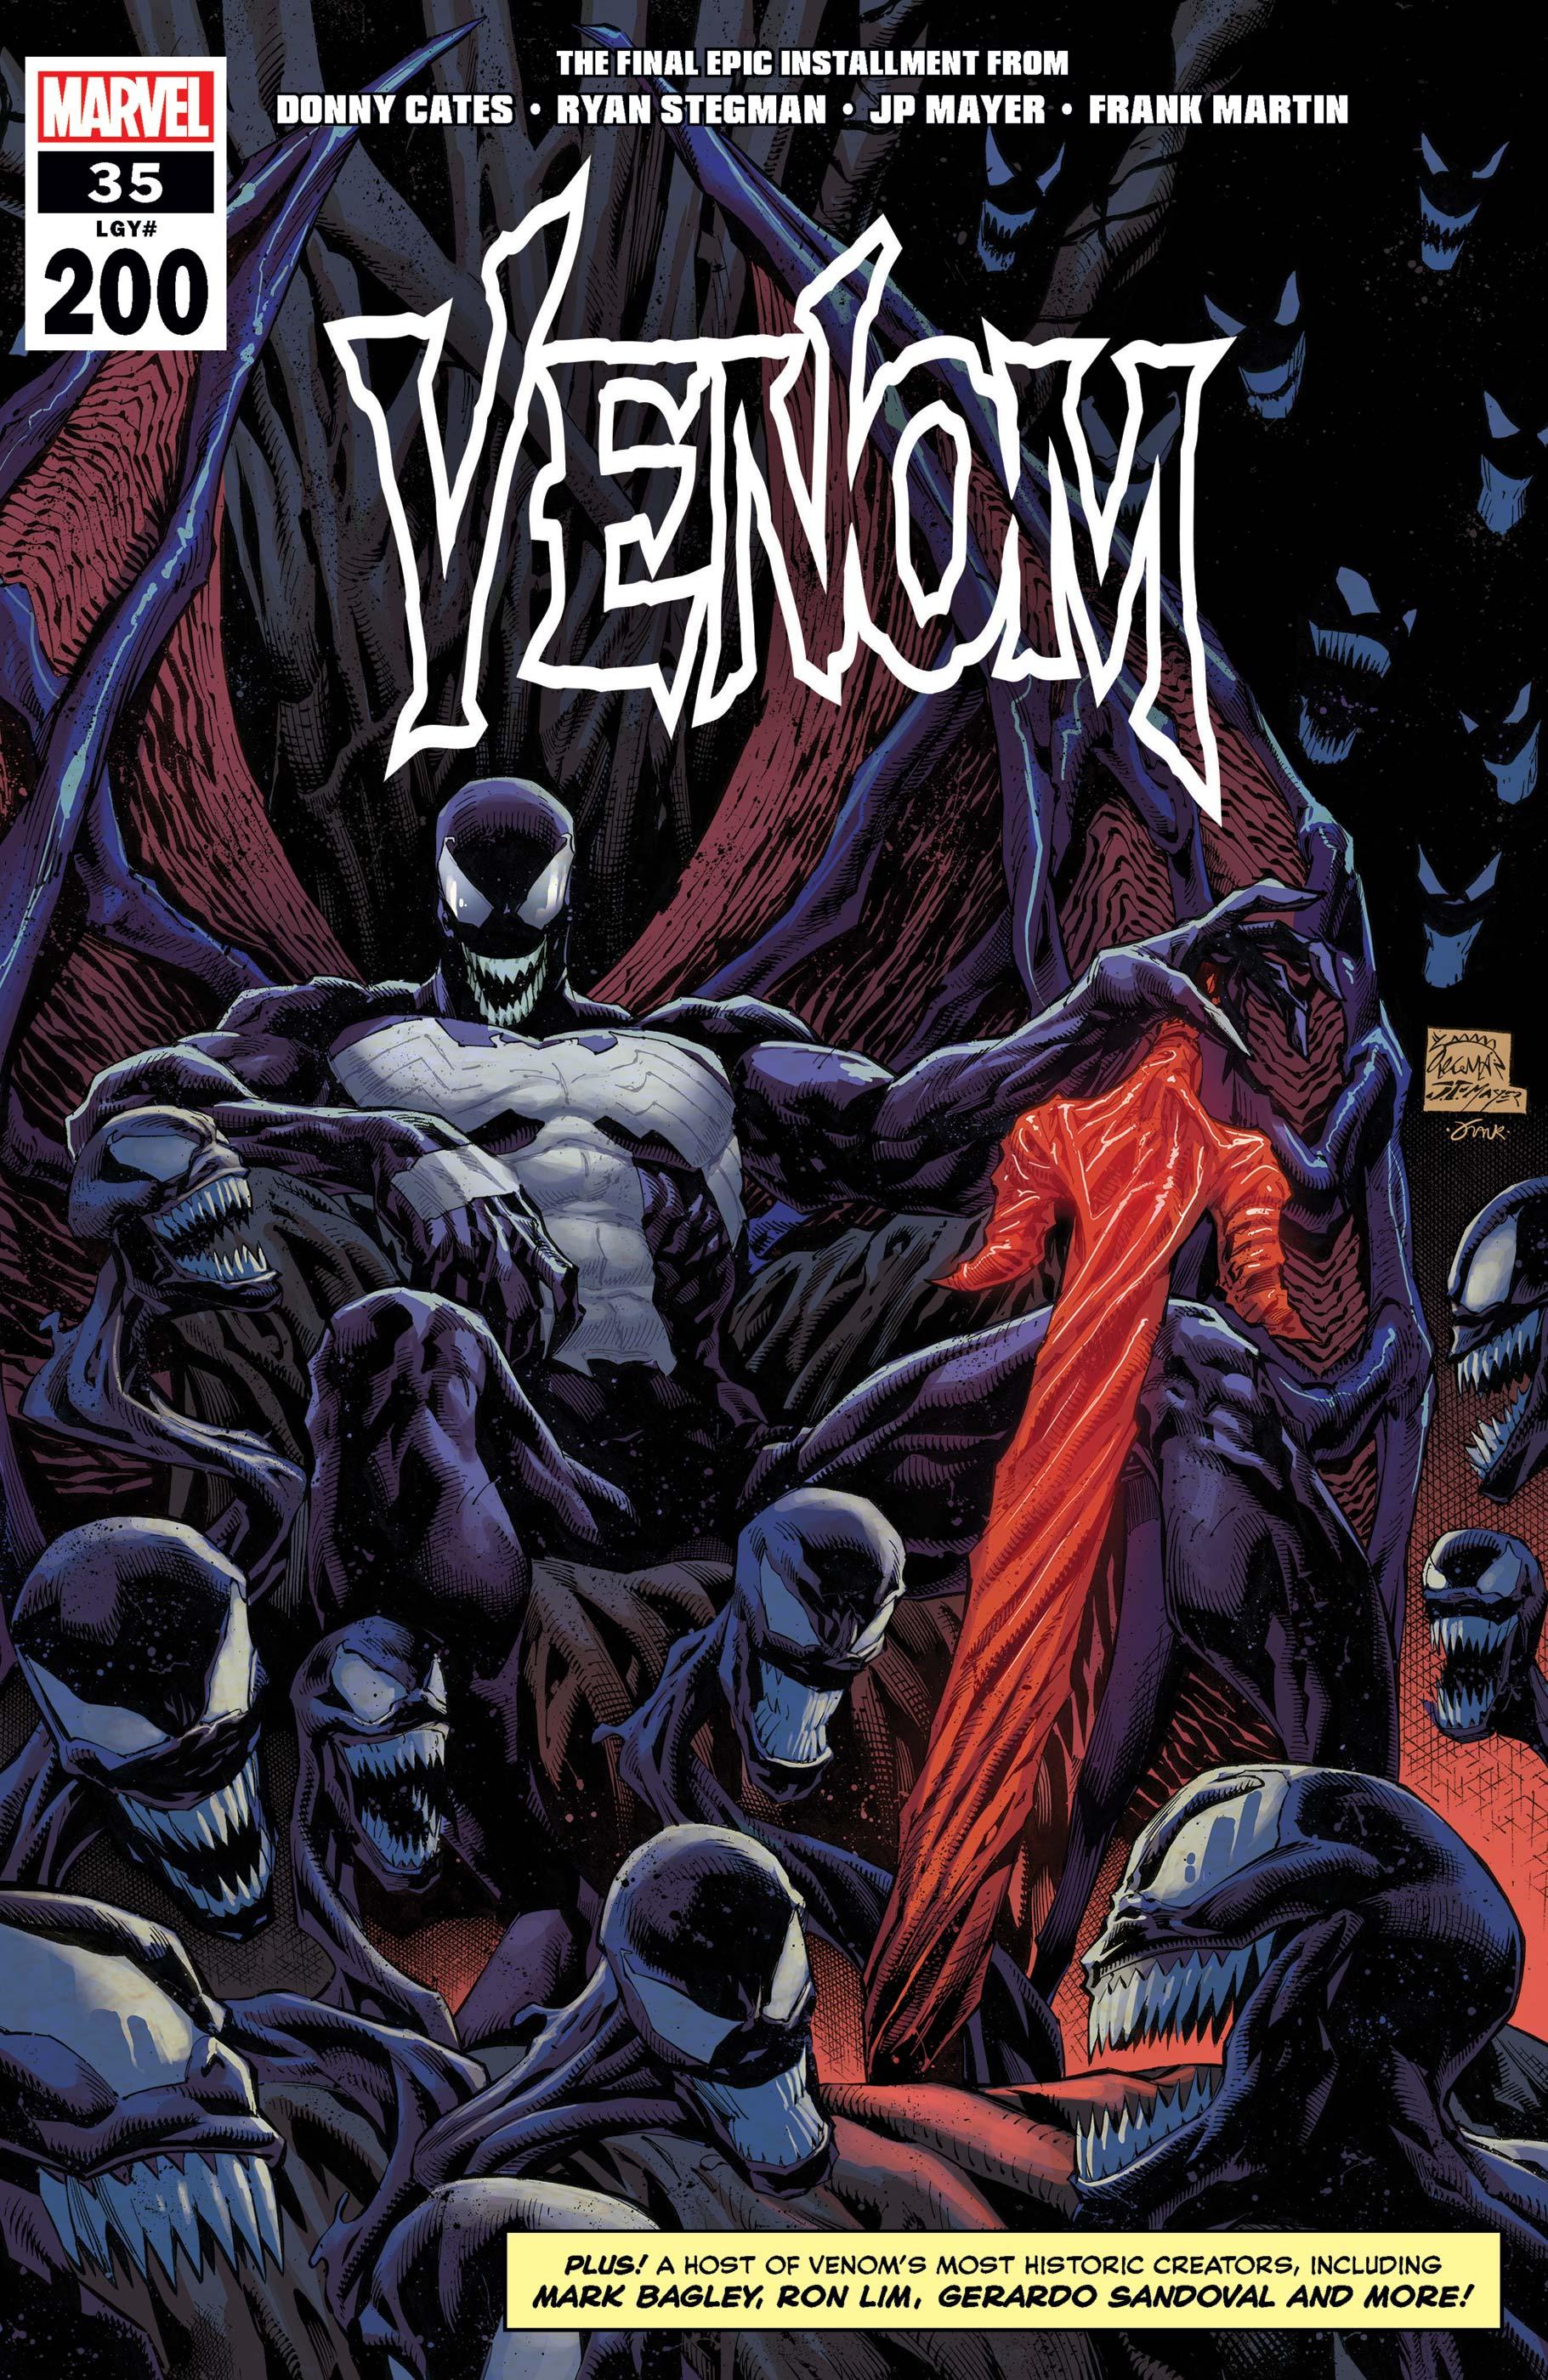 Venom (2018) #35